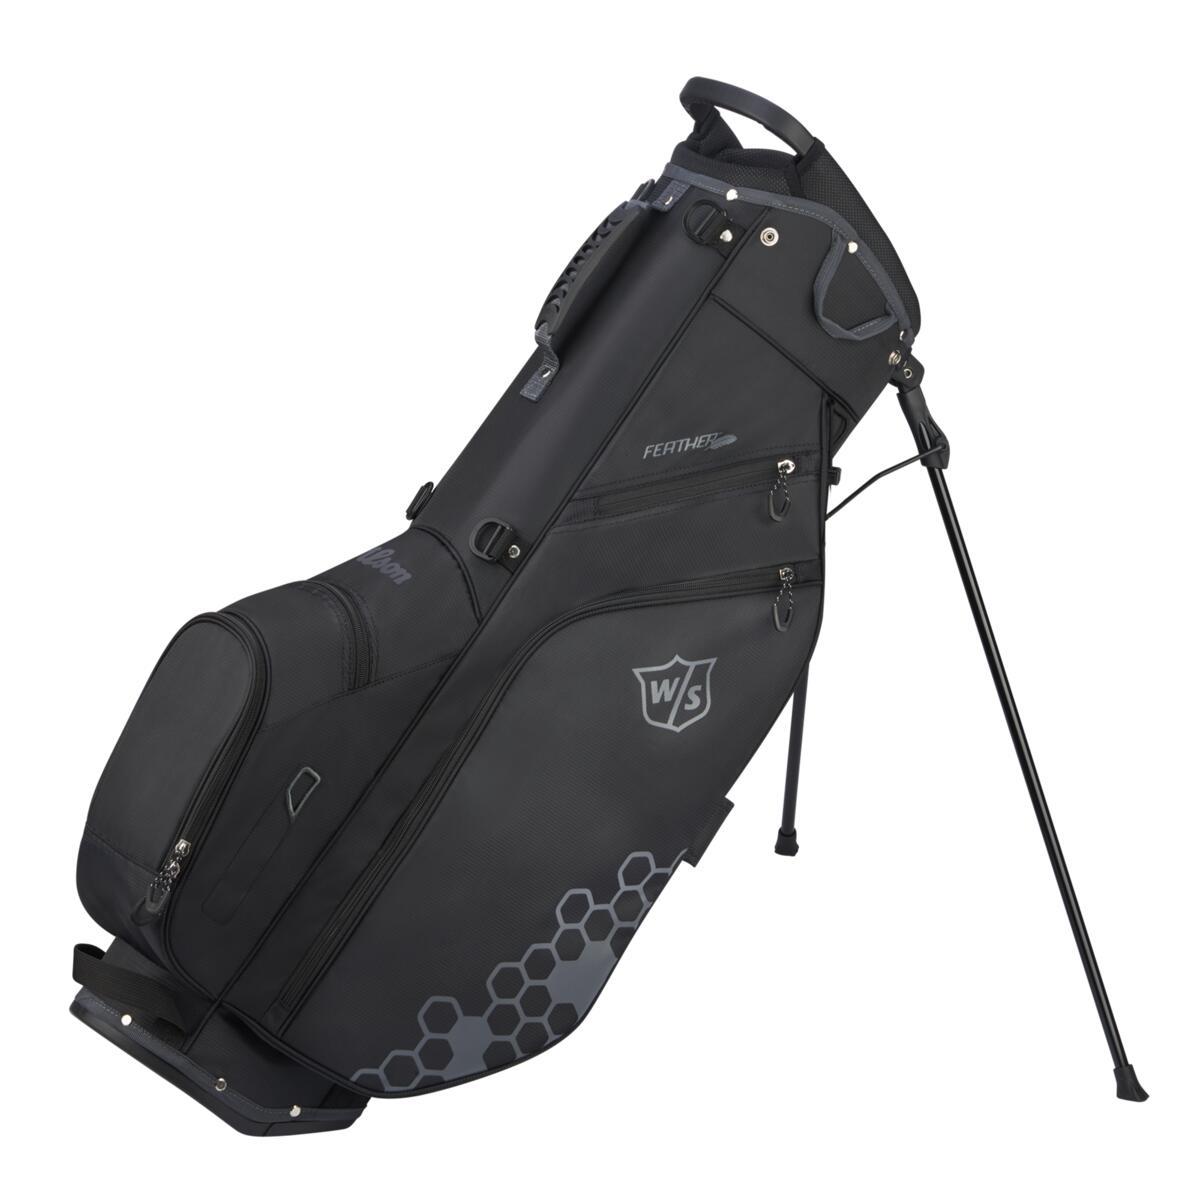 Wilson - W/S FEATHER Golf Bag BLBLGY